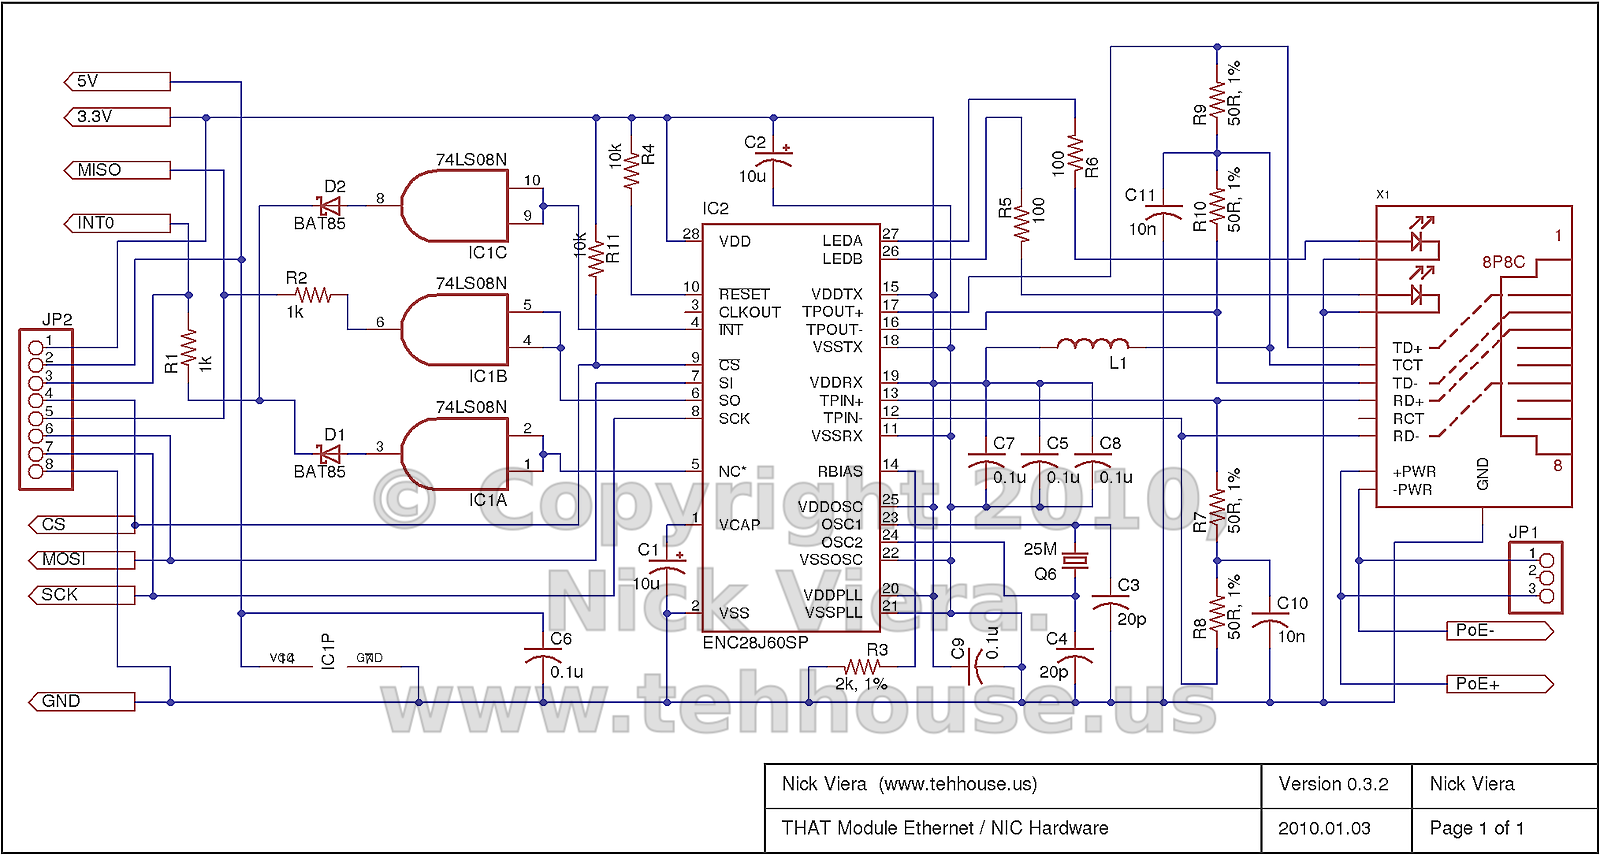 Diagram In Pictures Database Cat 5 Network Wiring Diagram Just Download Or Read Wiring Diagram 120 Turbosmart Boost Wiring Onyxum Com